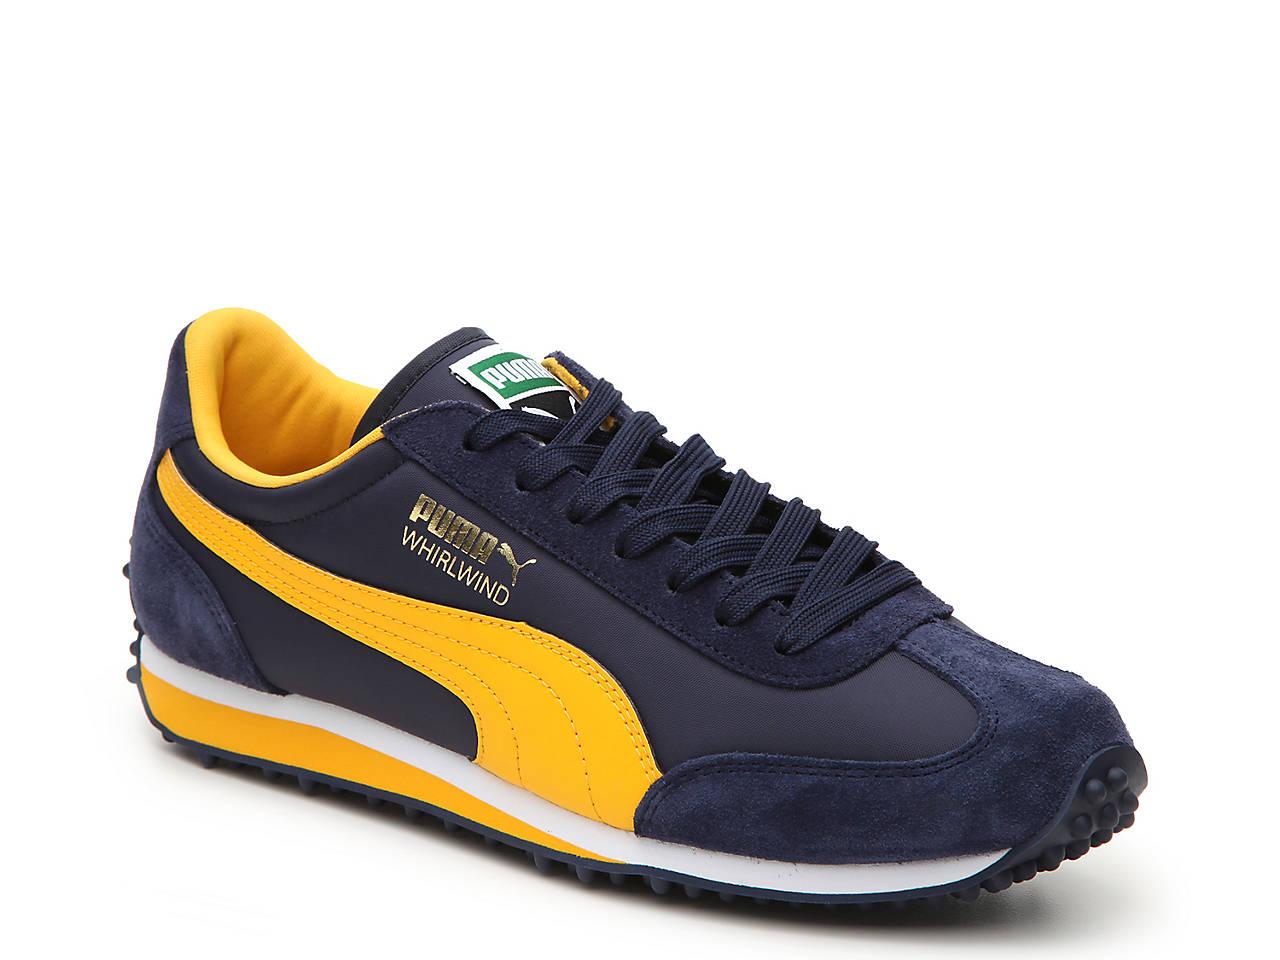 0780301f538 Puma Whirlwind Classic Sneaker - Men s Men s Shoes